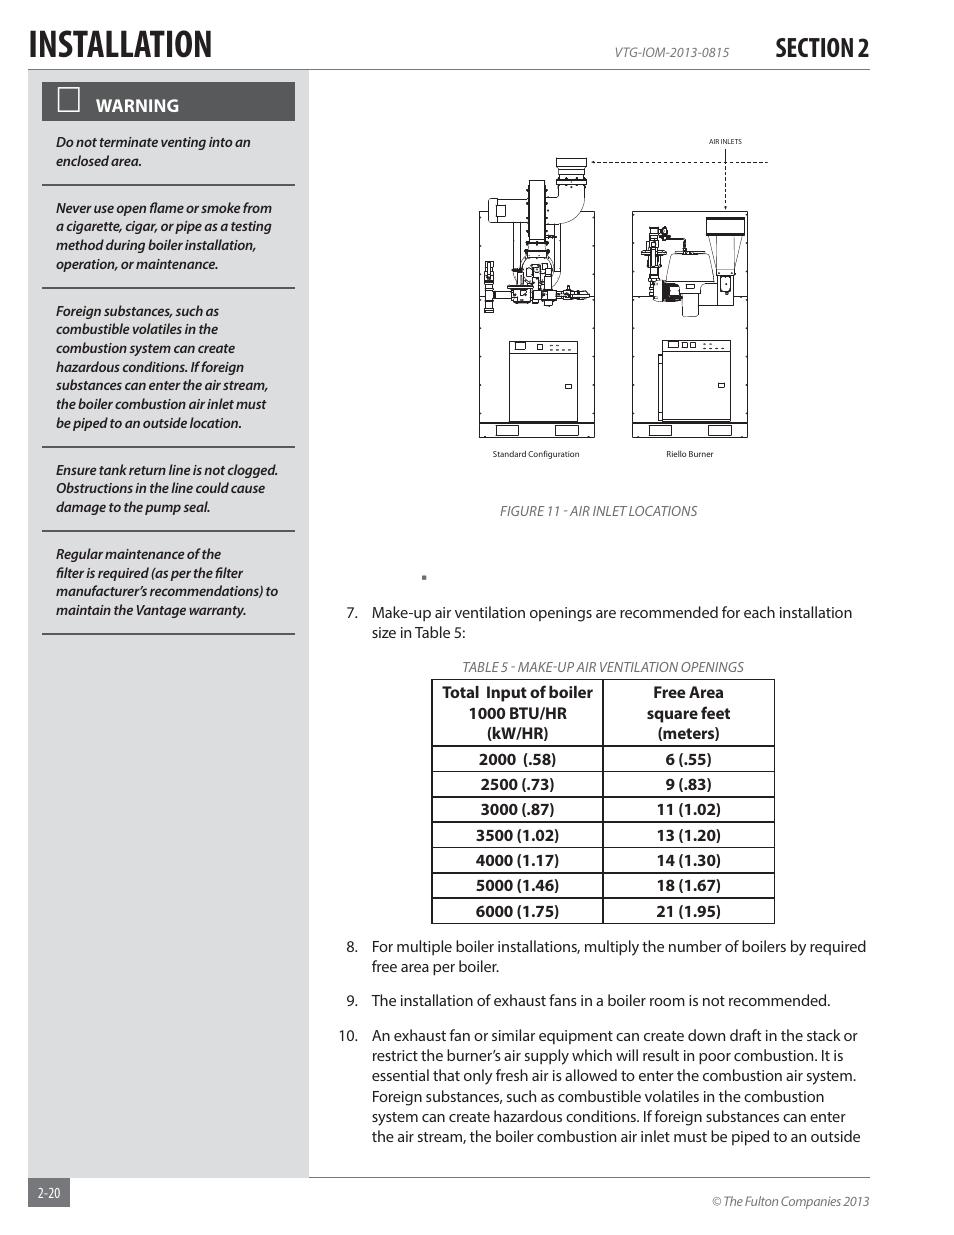 Fulton Vantage Boiler Manuals Enthusiast Wiring Diagrams Guitar For Installation Vtg Fully Condensing Hydronic Rh Manualsdir Com Manual